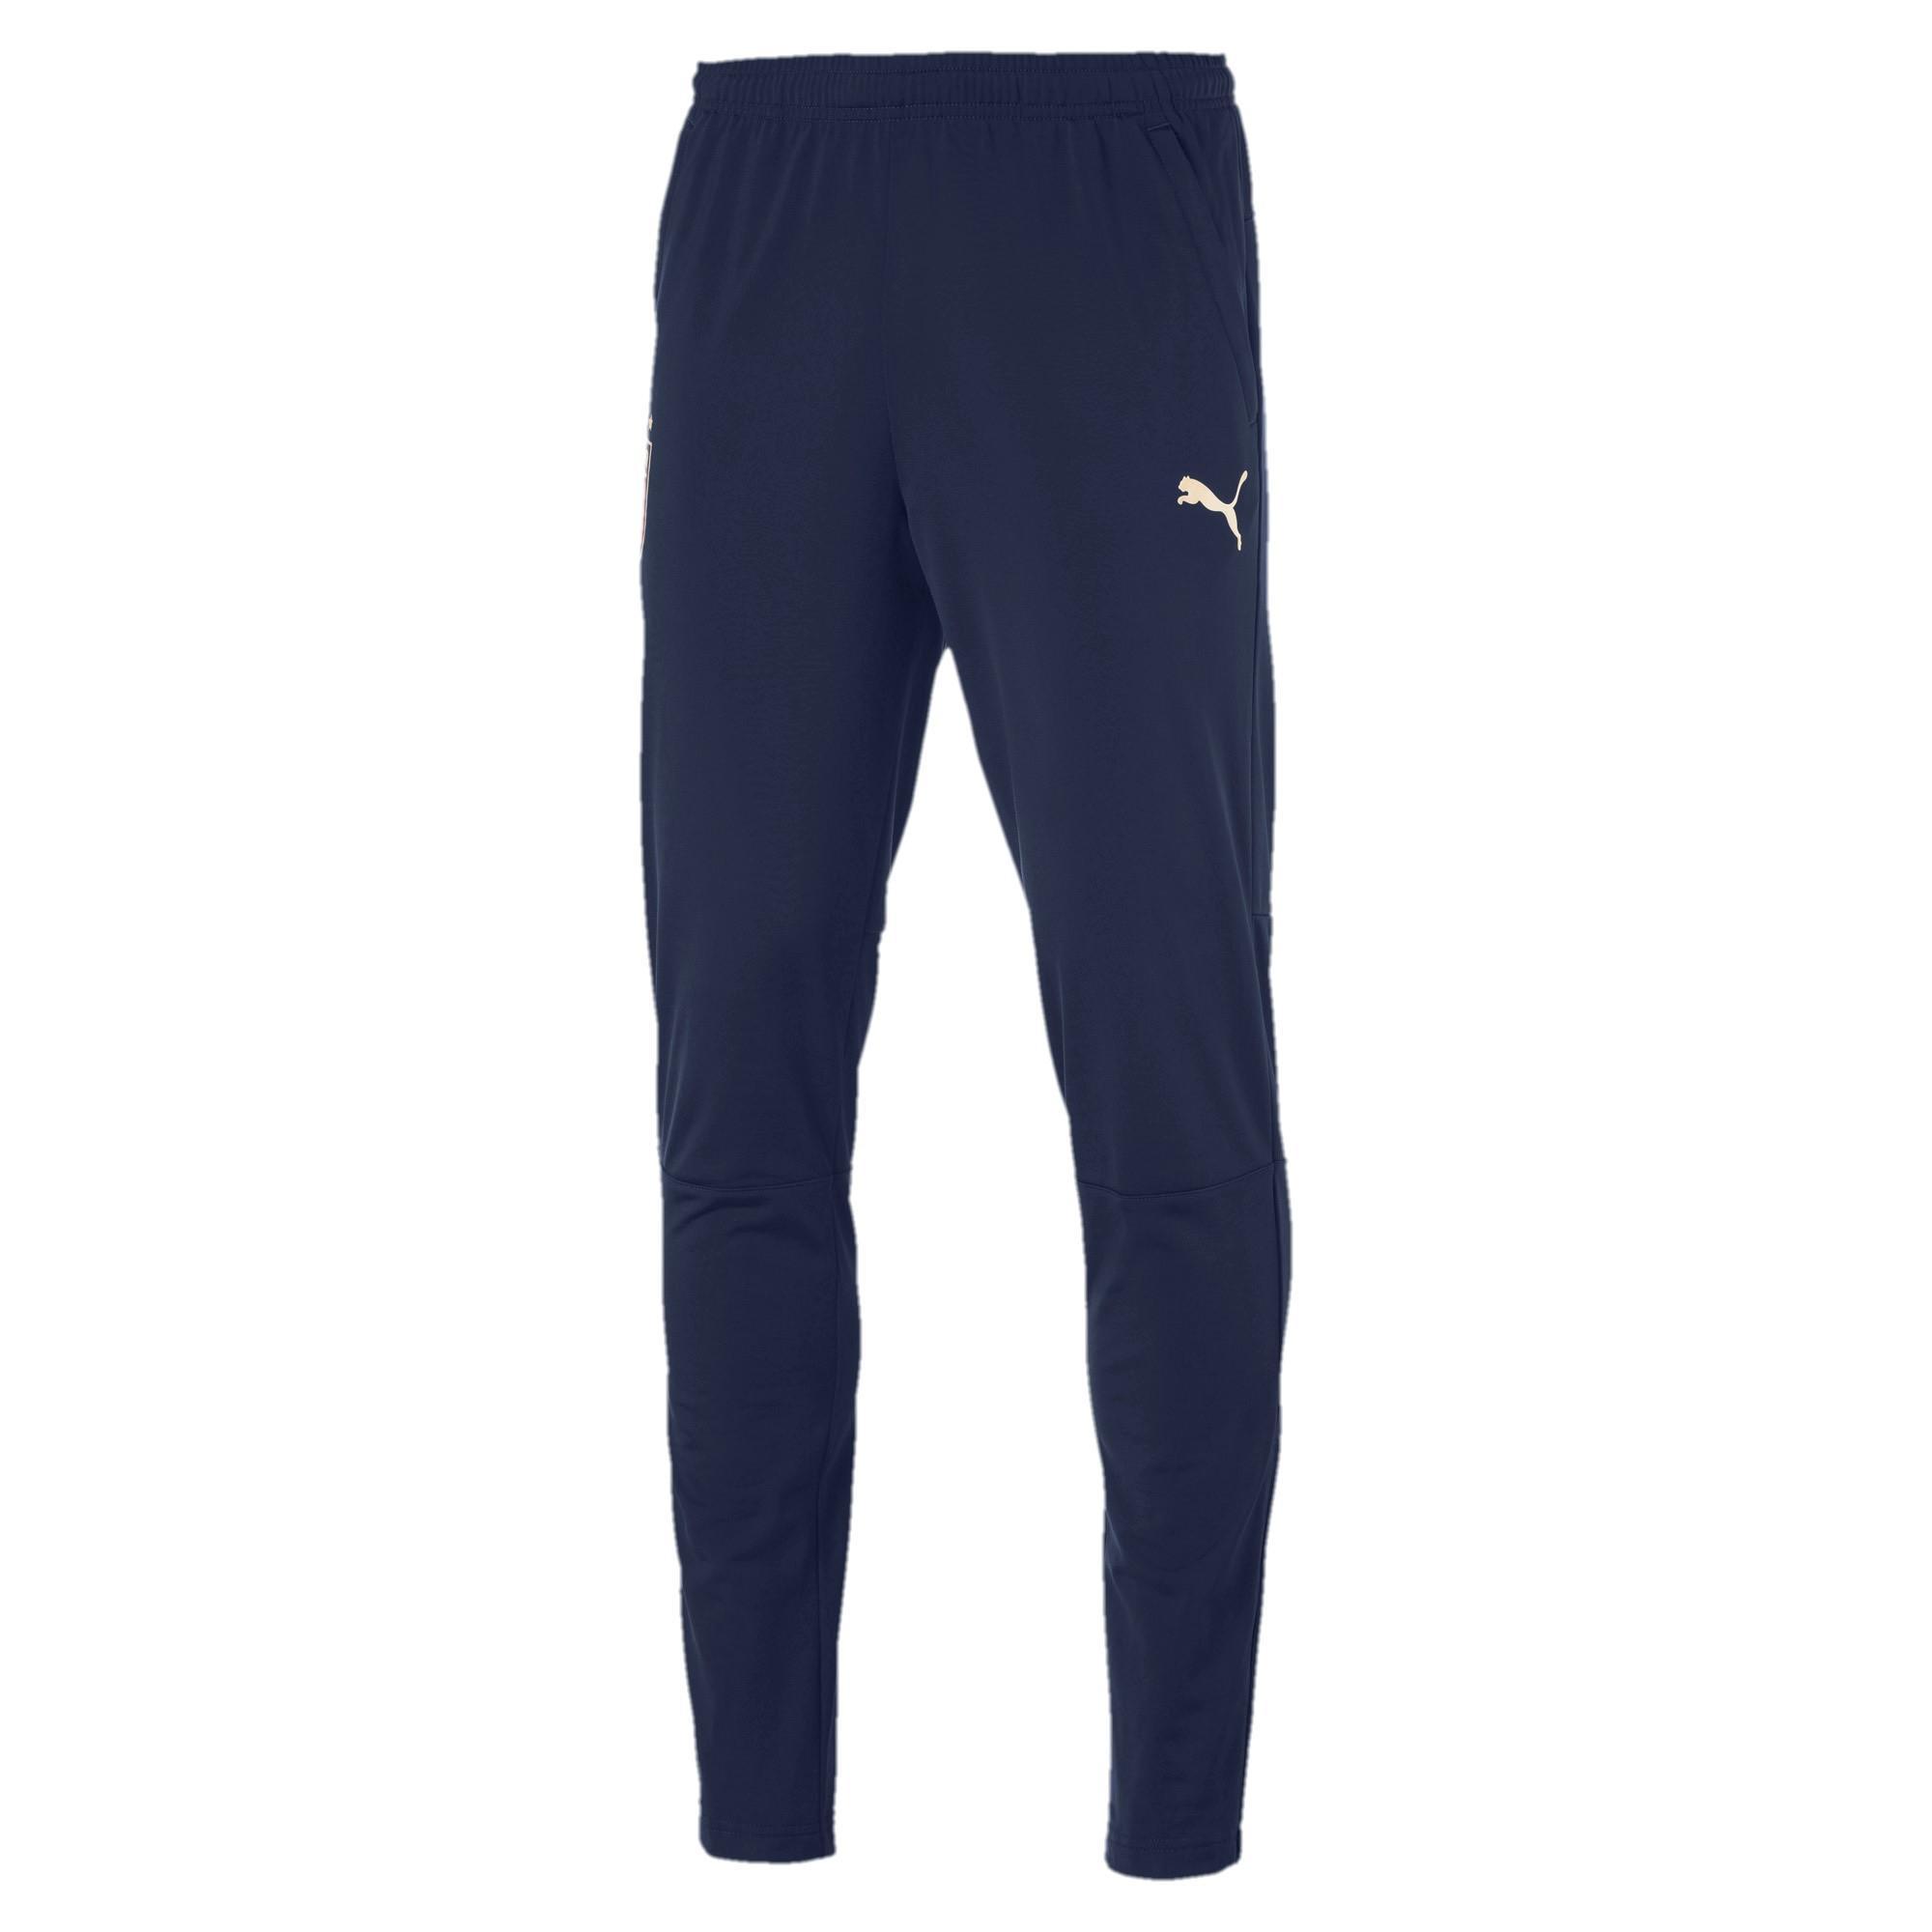 Pantaloni Allenamento Figc